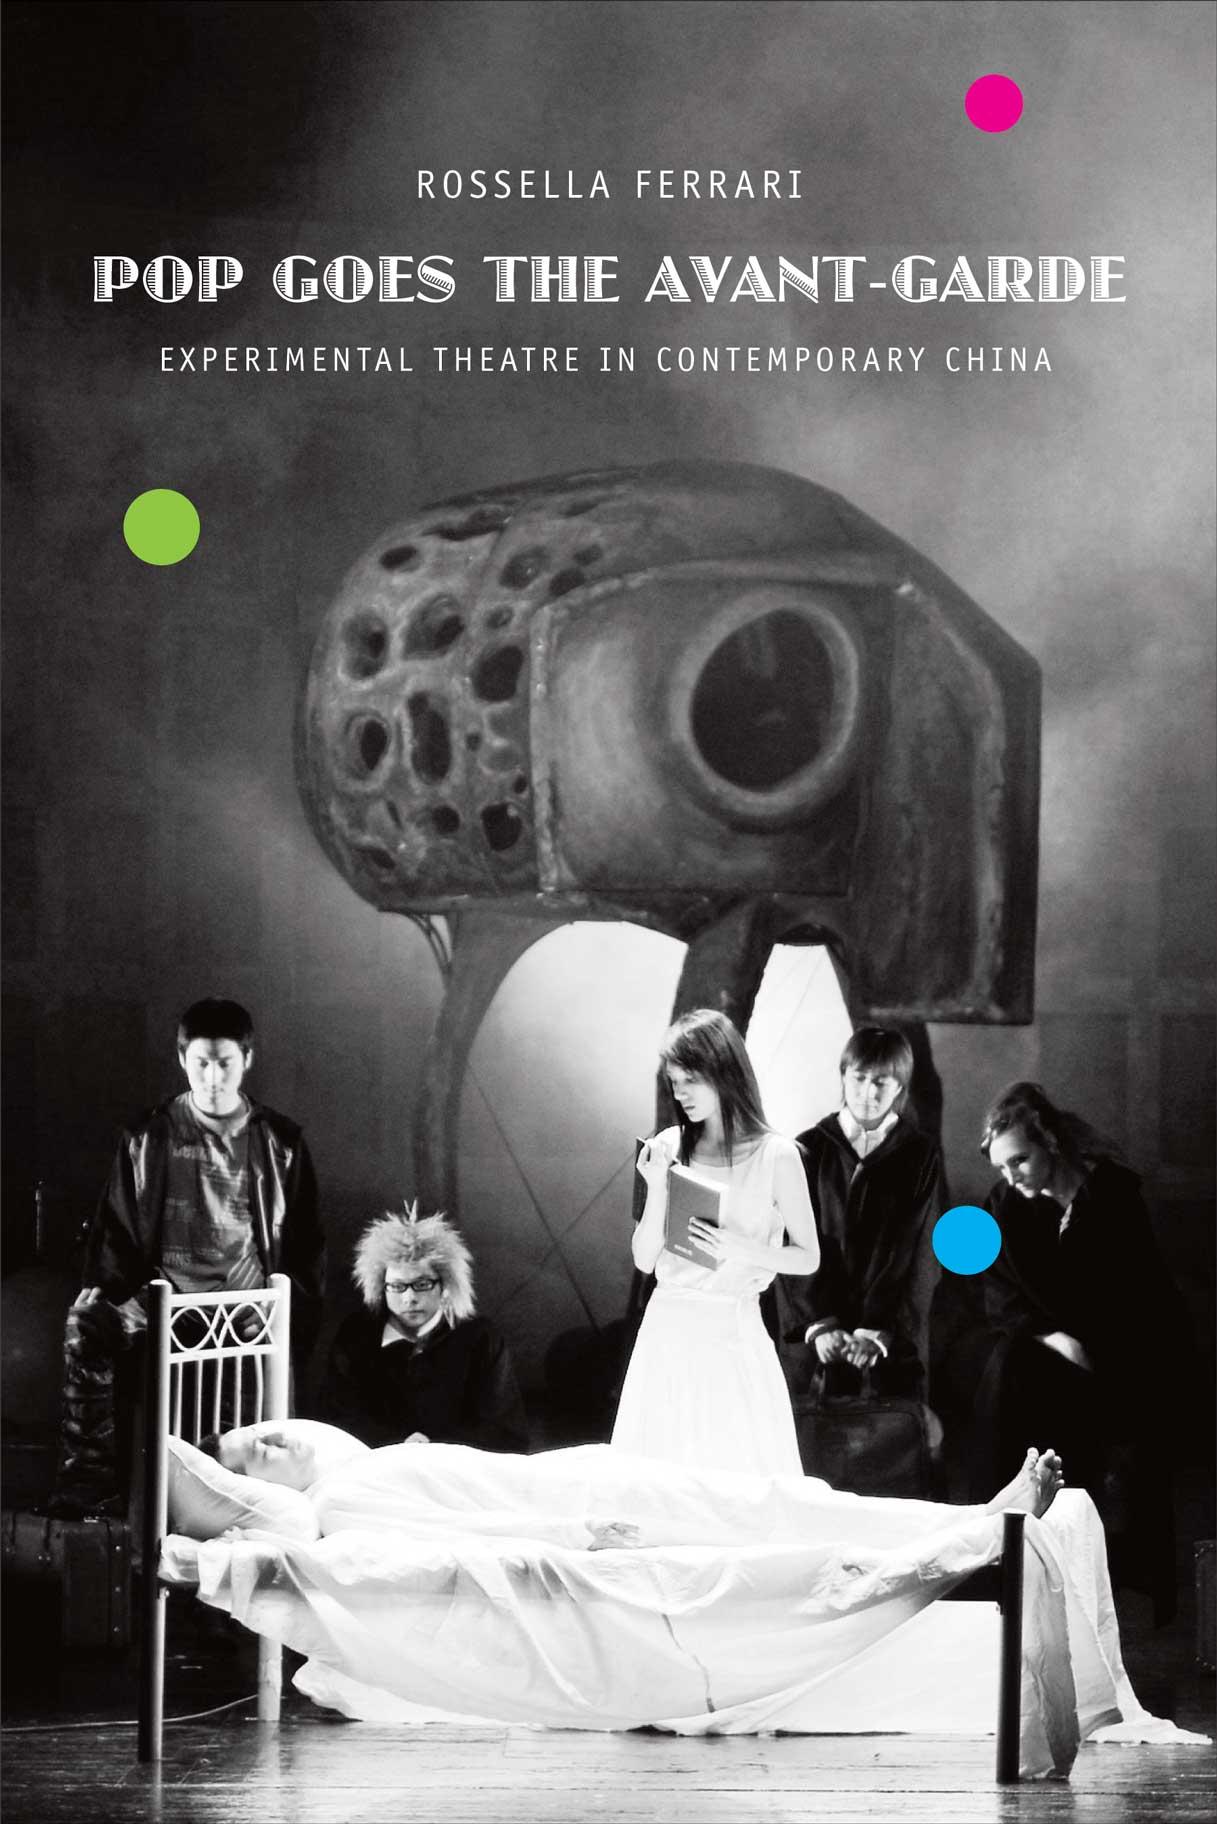 Pop Goes the Avant-Garde:  Experimental Theatre in Contemporary China by Rossella Ferrari |  Seagull Books